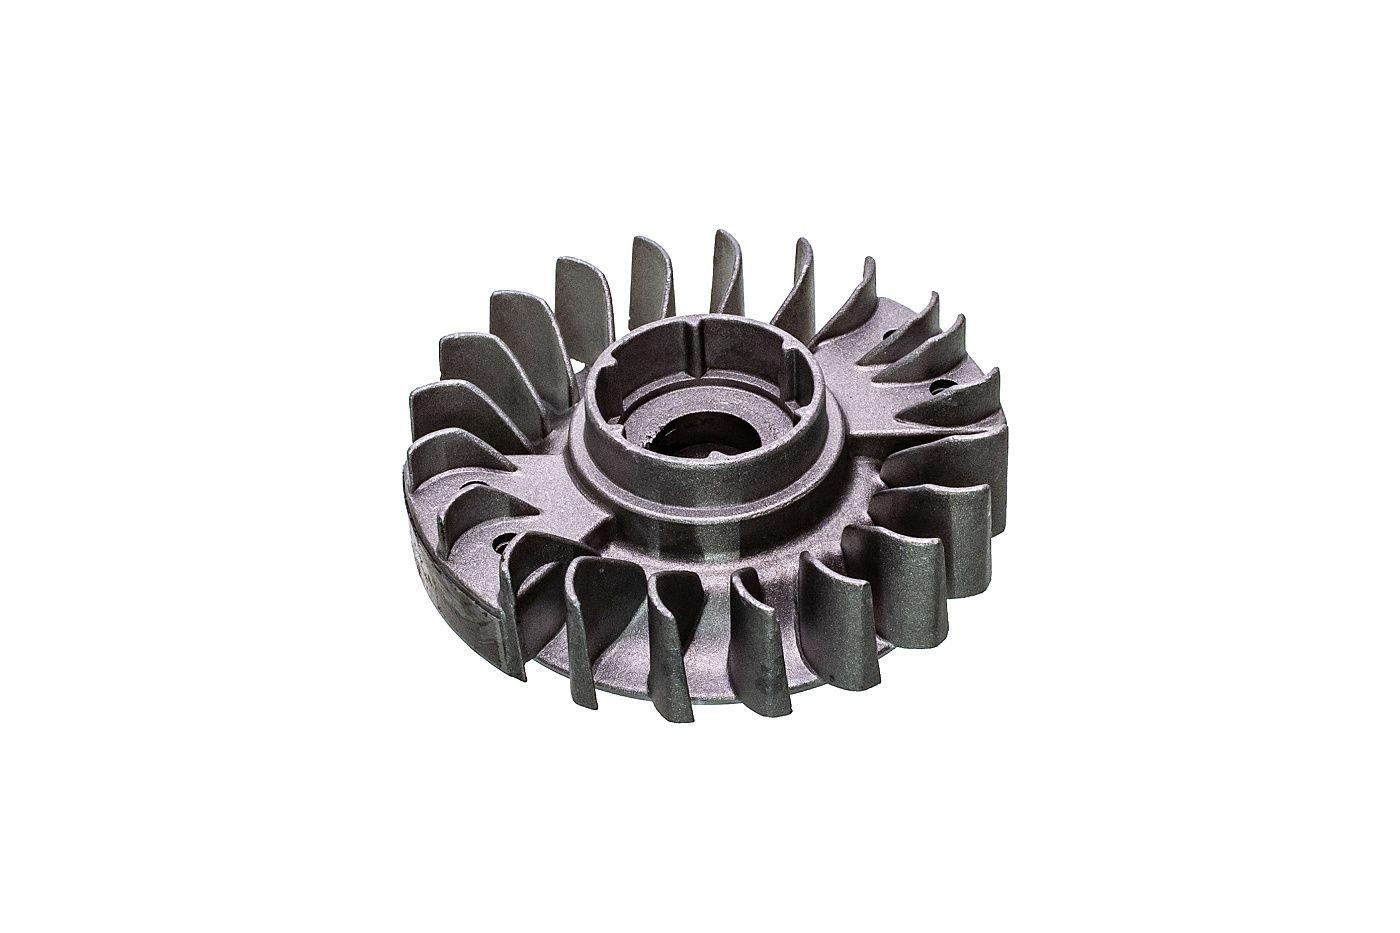 Ventilátor Stihl MS 440 044